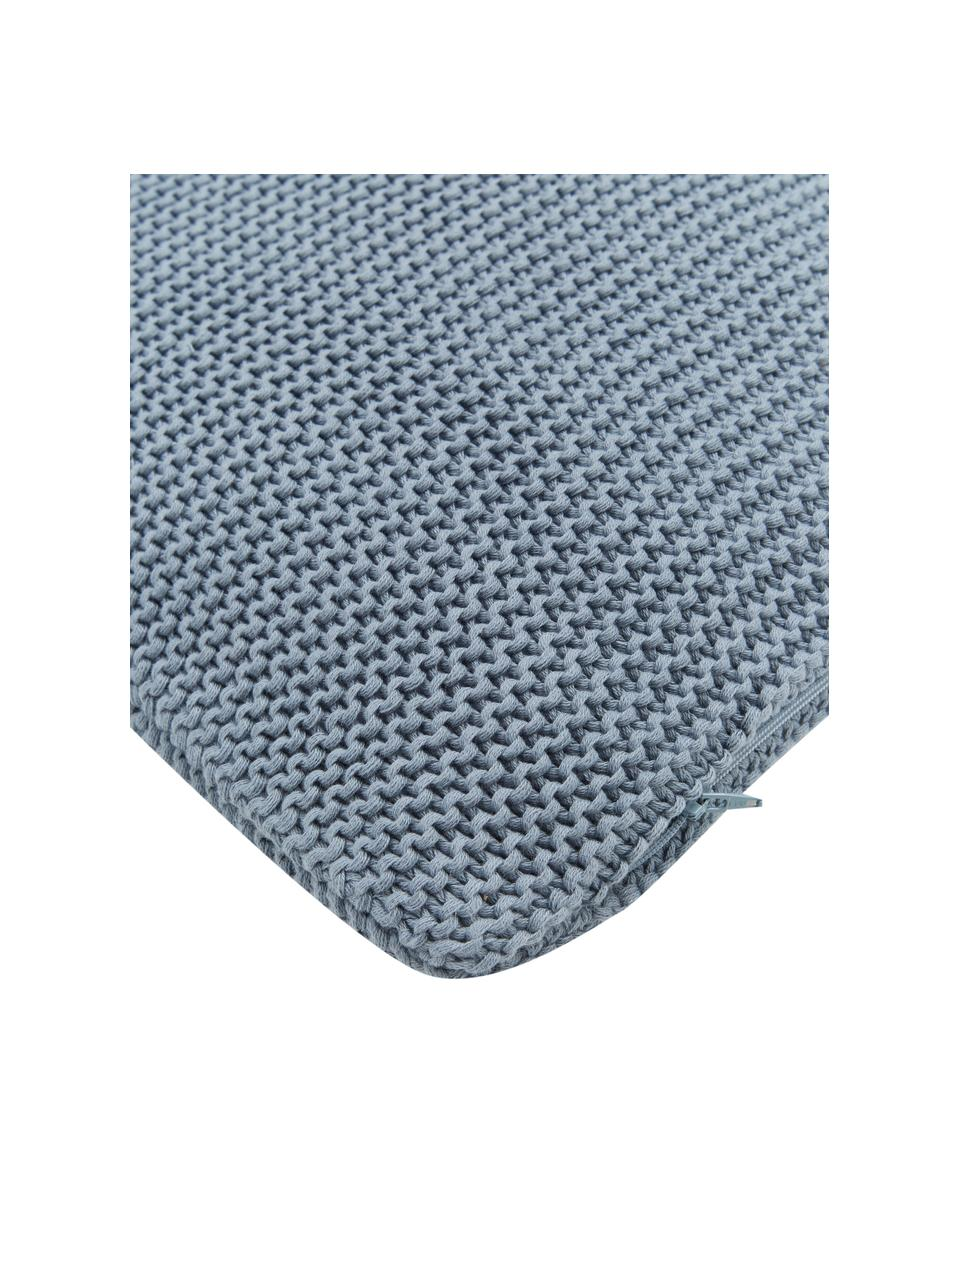 Strick-Kissenhülle Adalyn aus Bio-Baumwolle in Blau, 100% Bio-Baumwolle, GOTS-zertifiziert, Blau, 30 x 50 cm